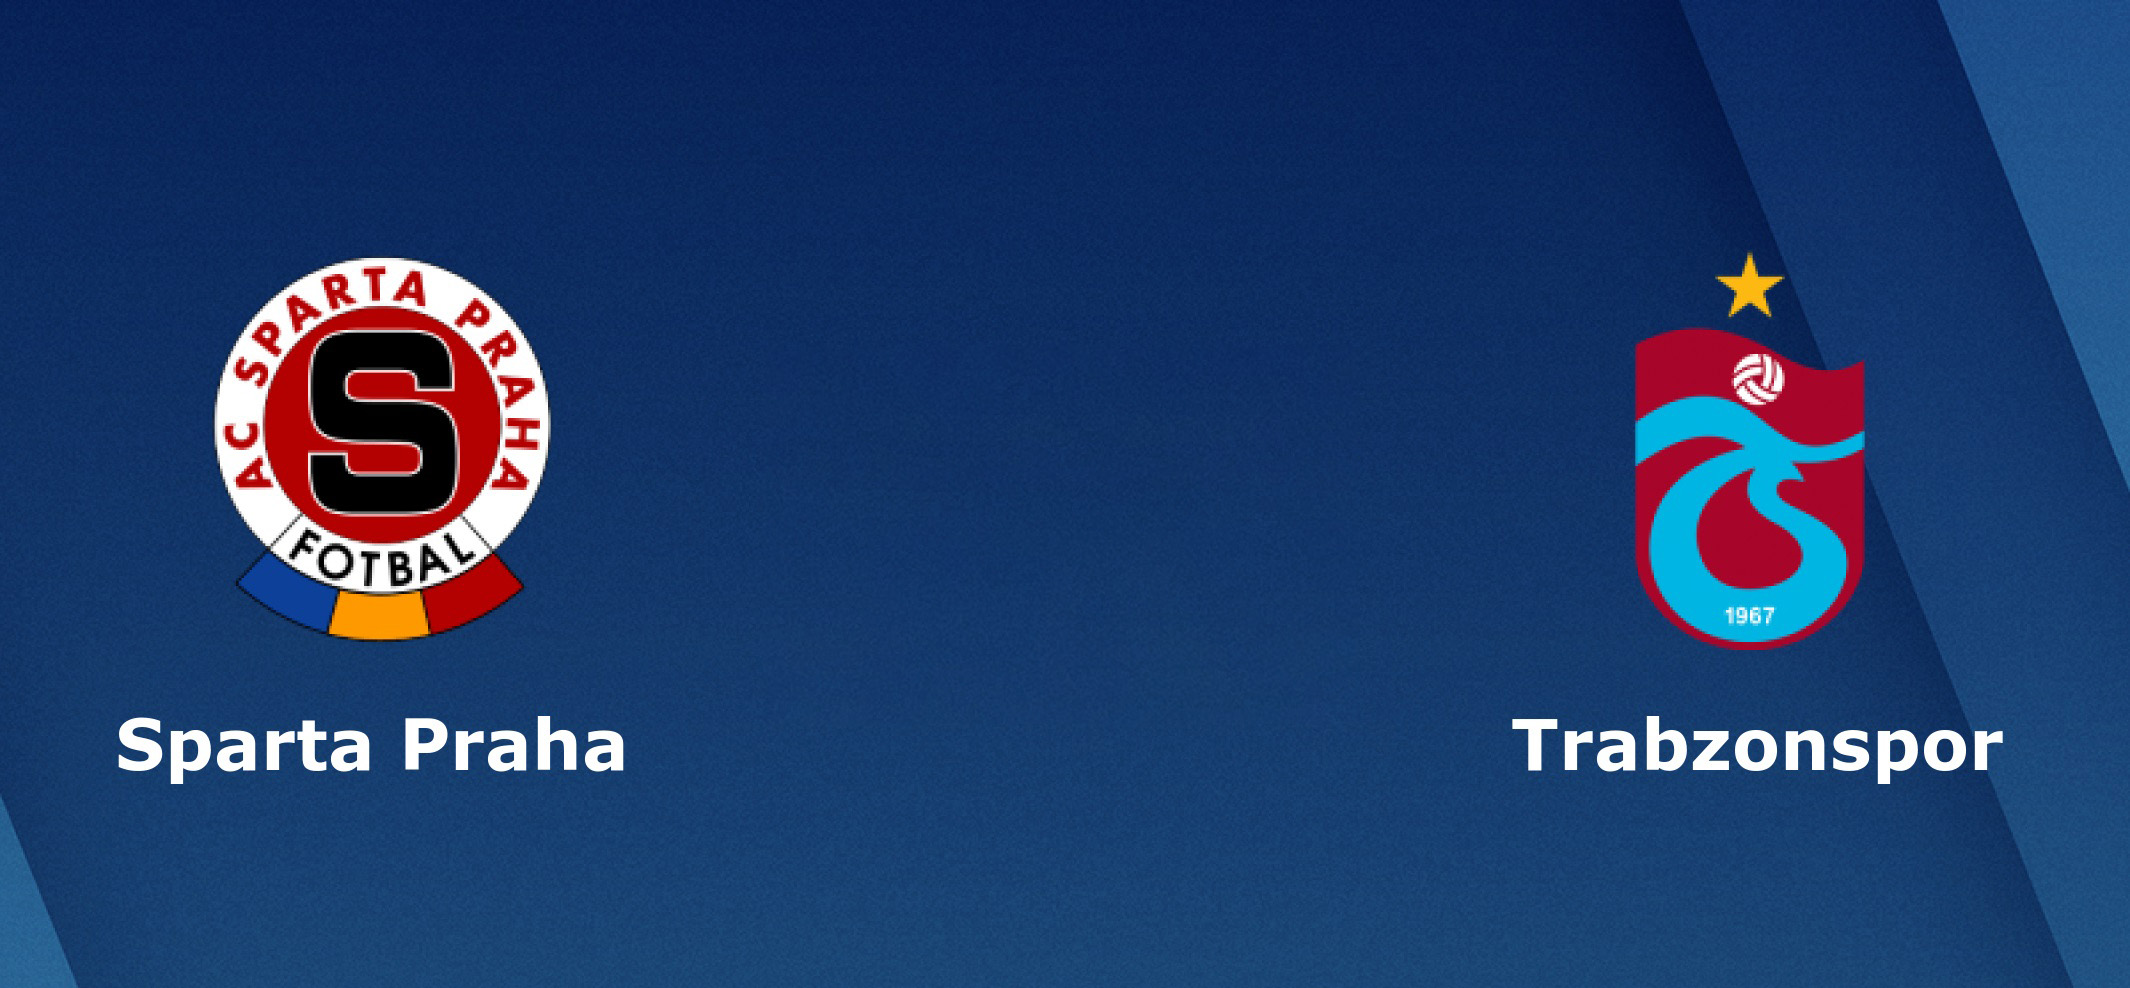 trabzonspor-sparta-praha-8321754